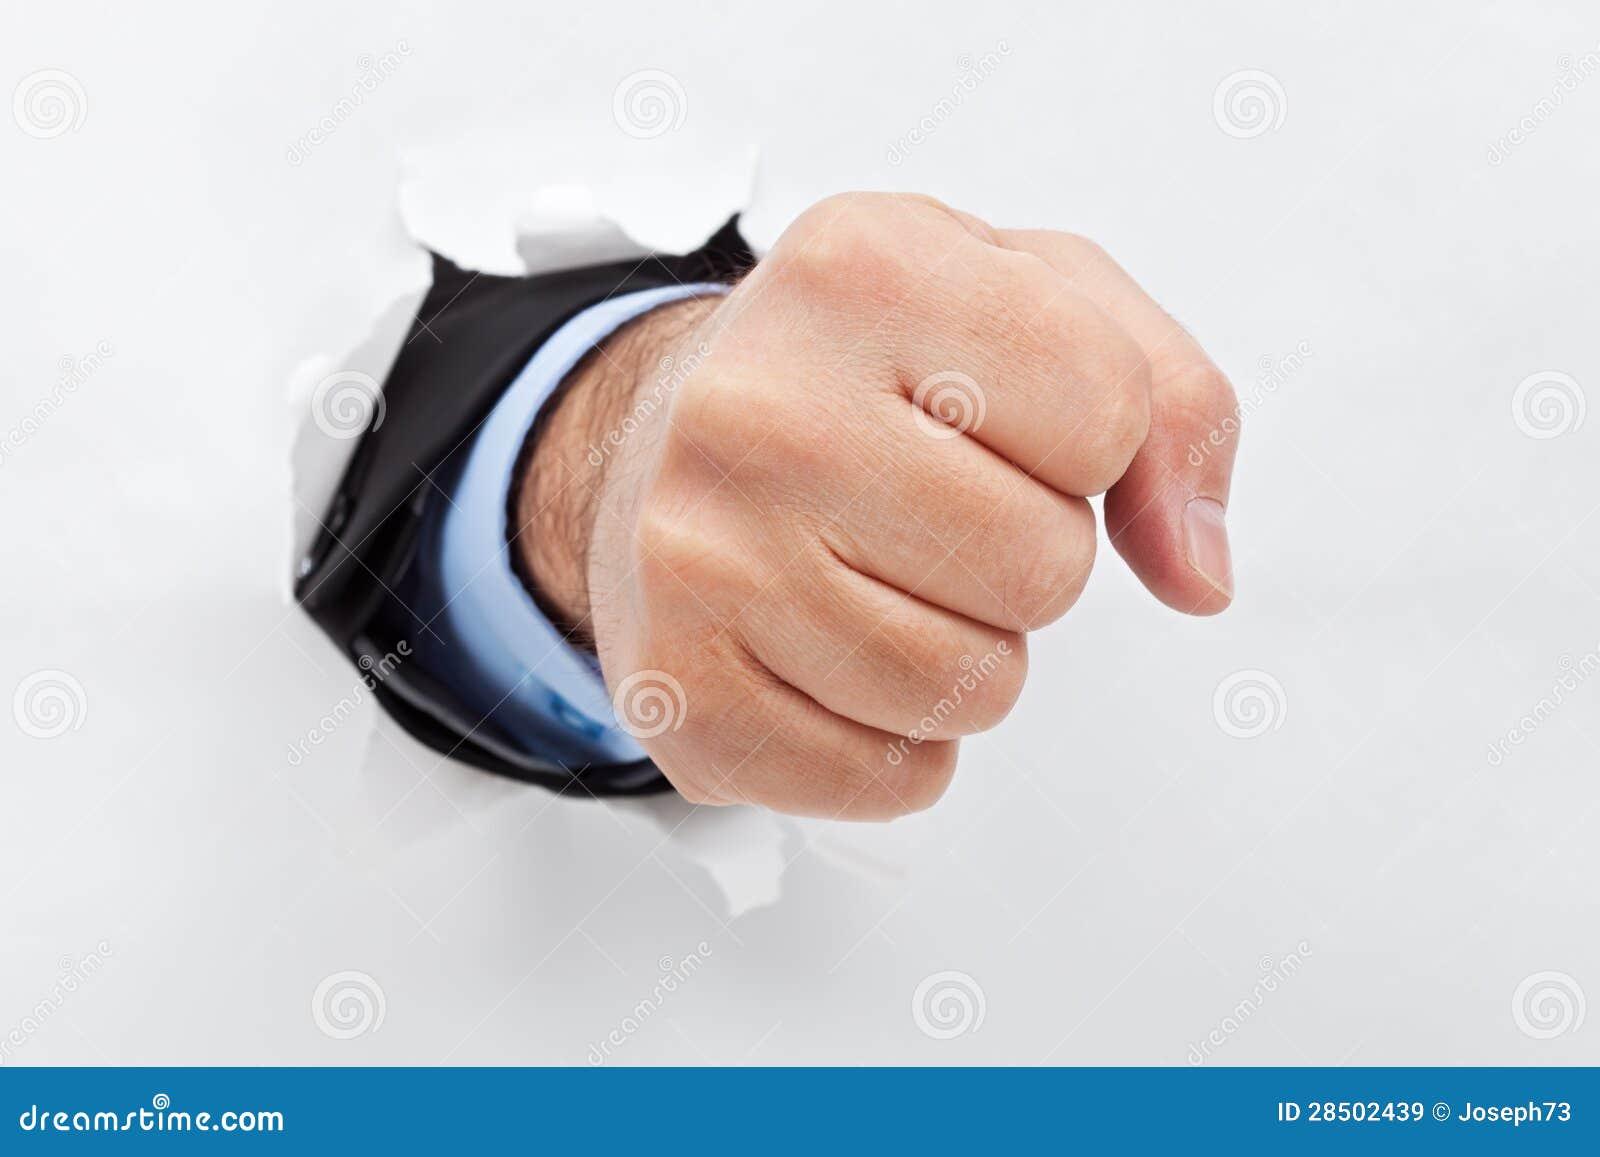 Thumb through fist